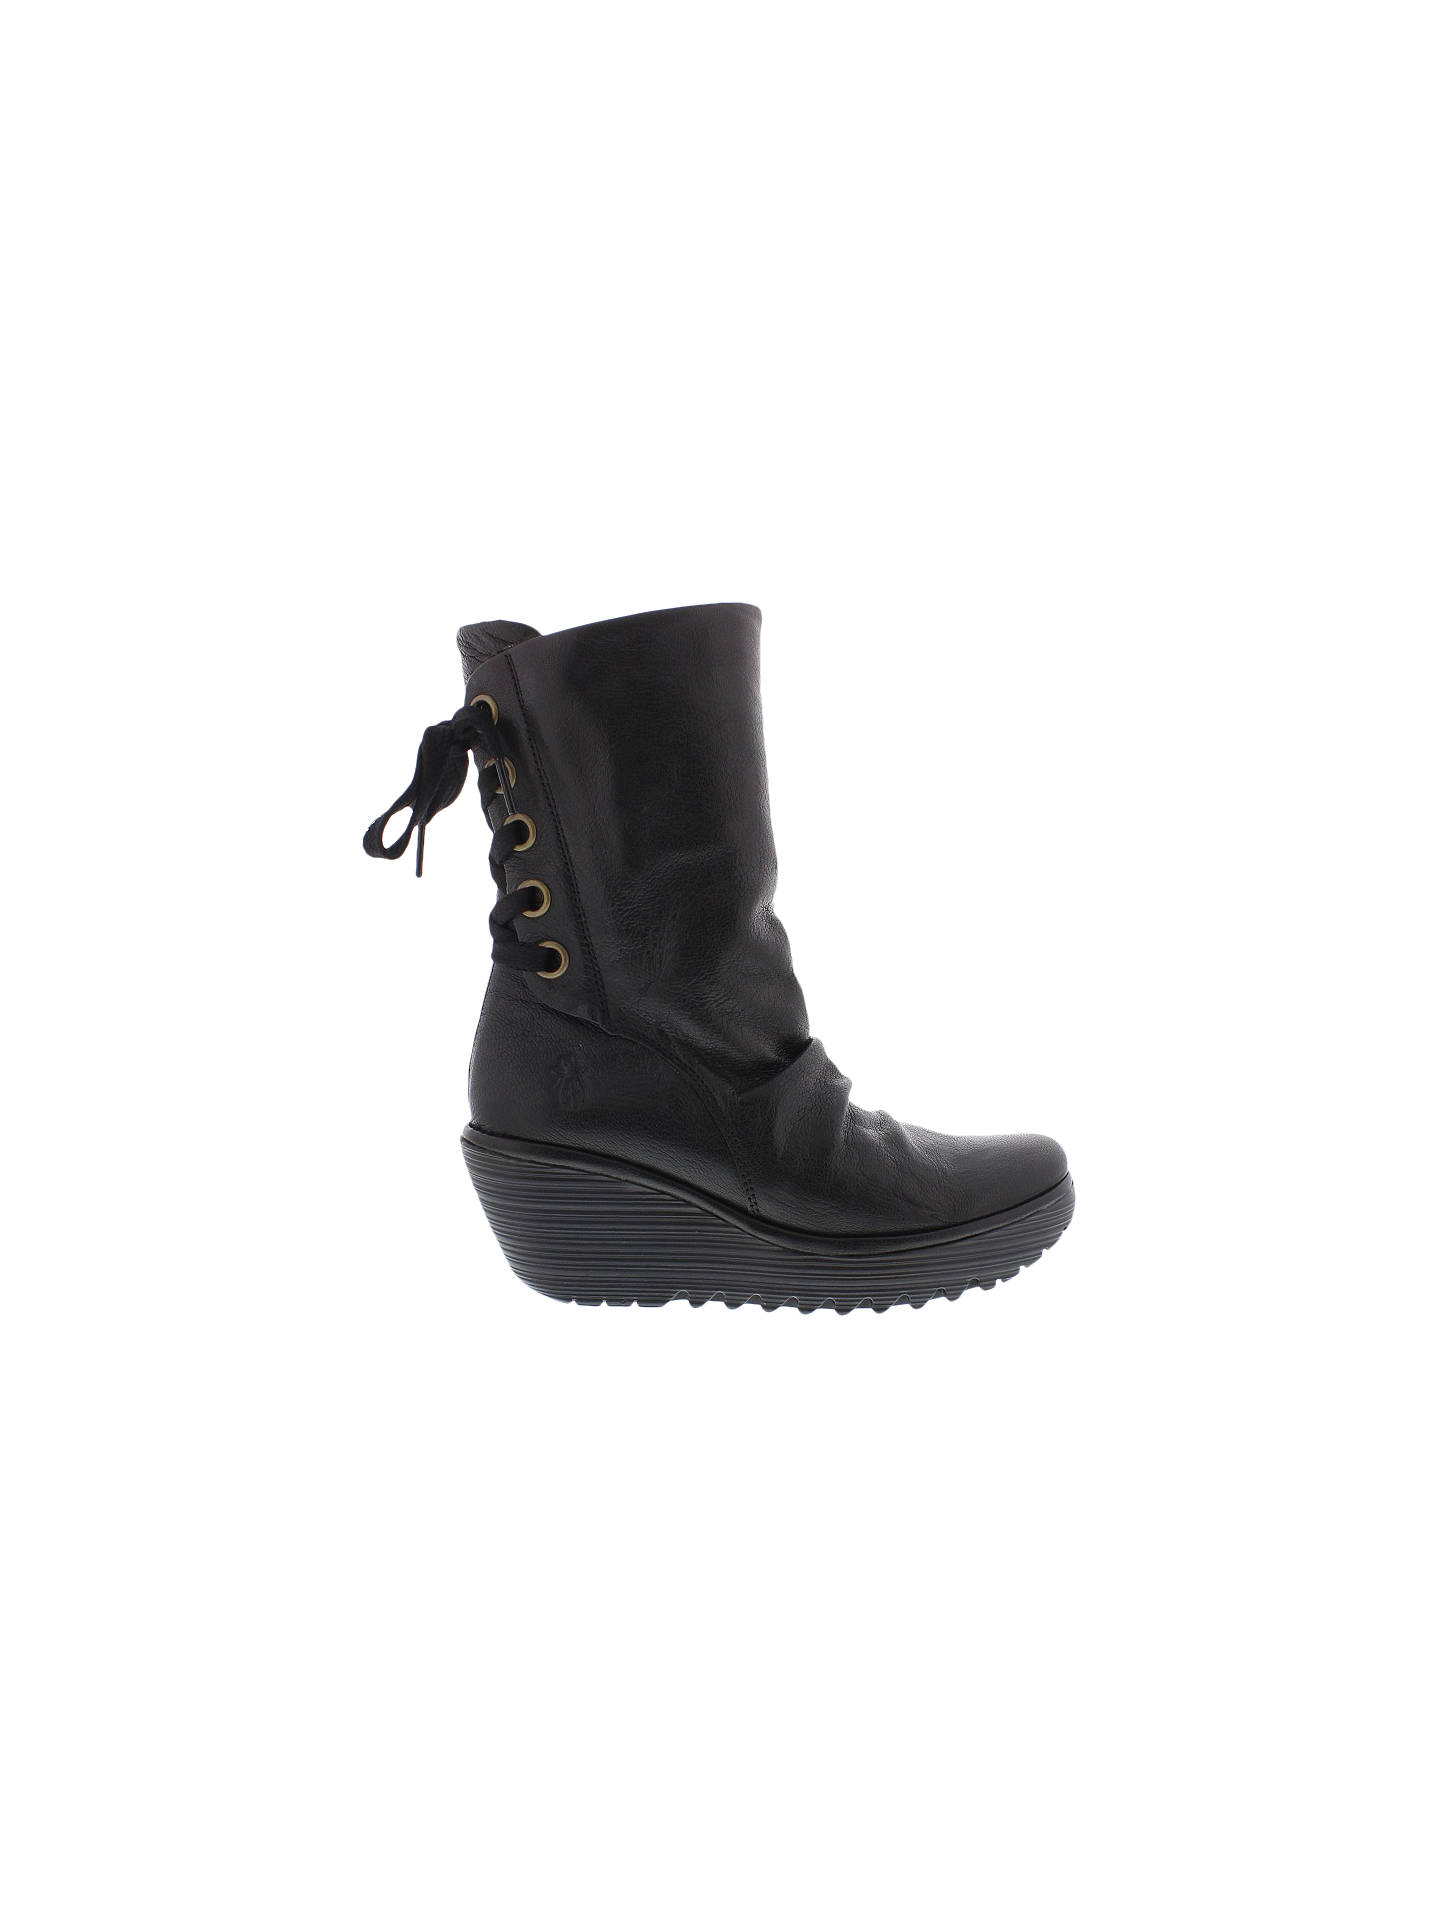 51df6548c4c Fly London Yada Wedge Heel Calf Boots, Black at John Lewis & Partners